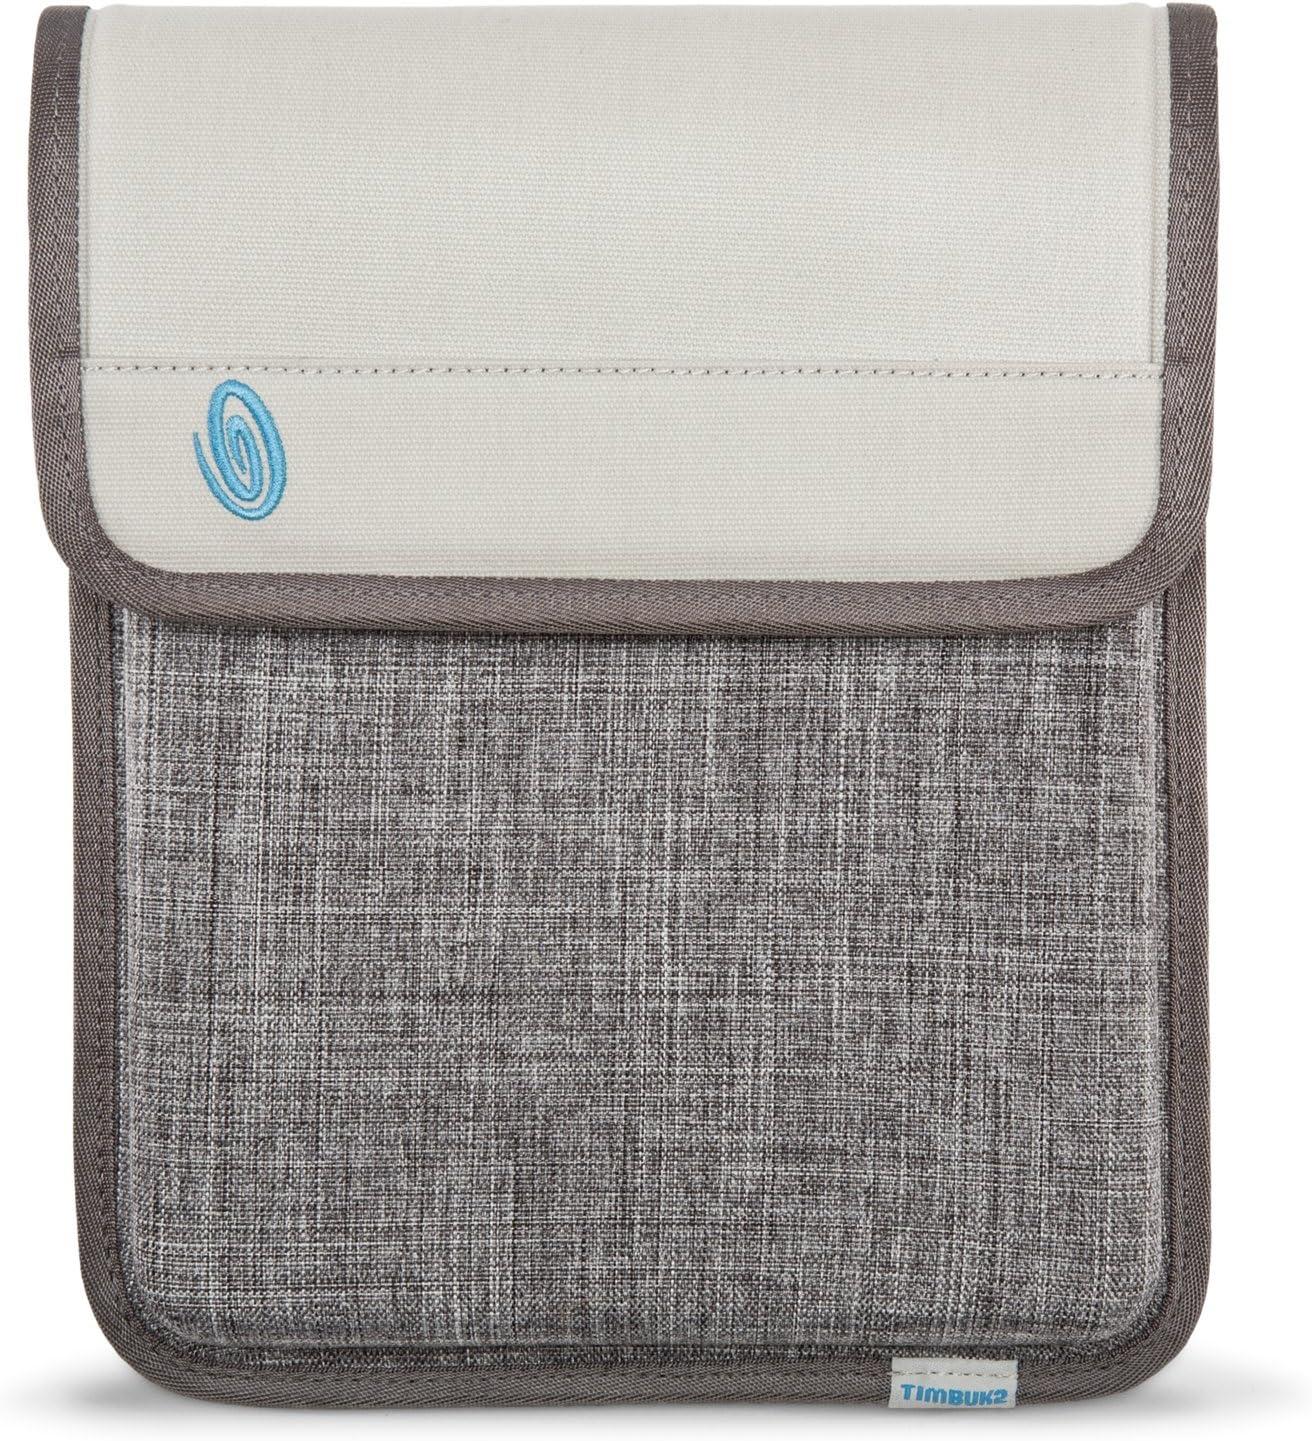 Timbuk2 Pop Up Sleeve for new iPad and iPad 2